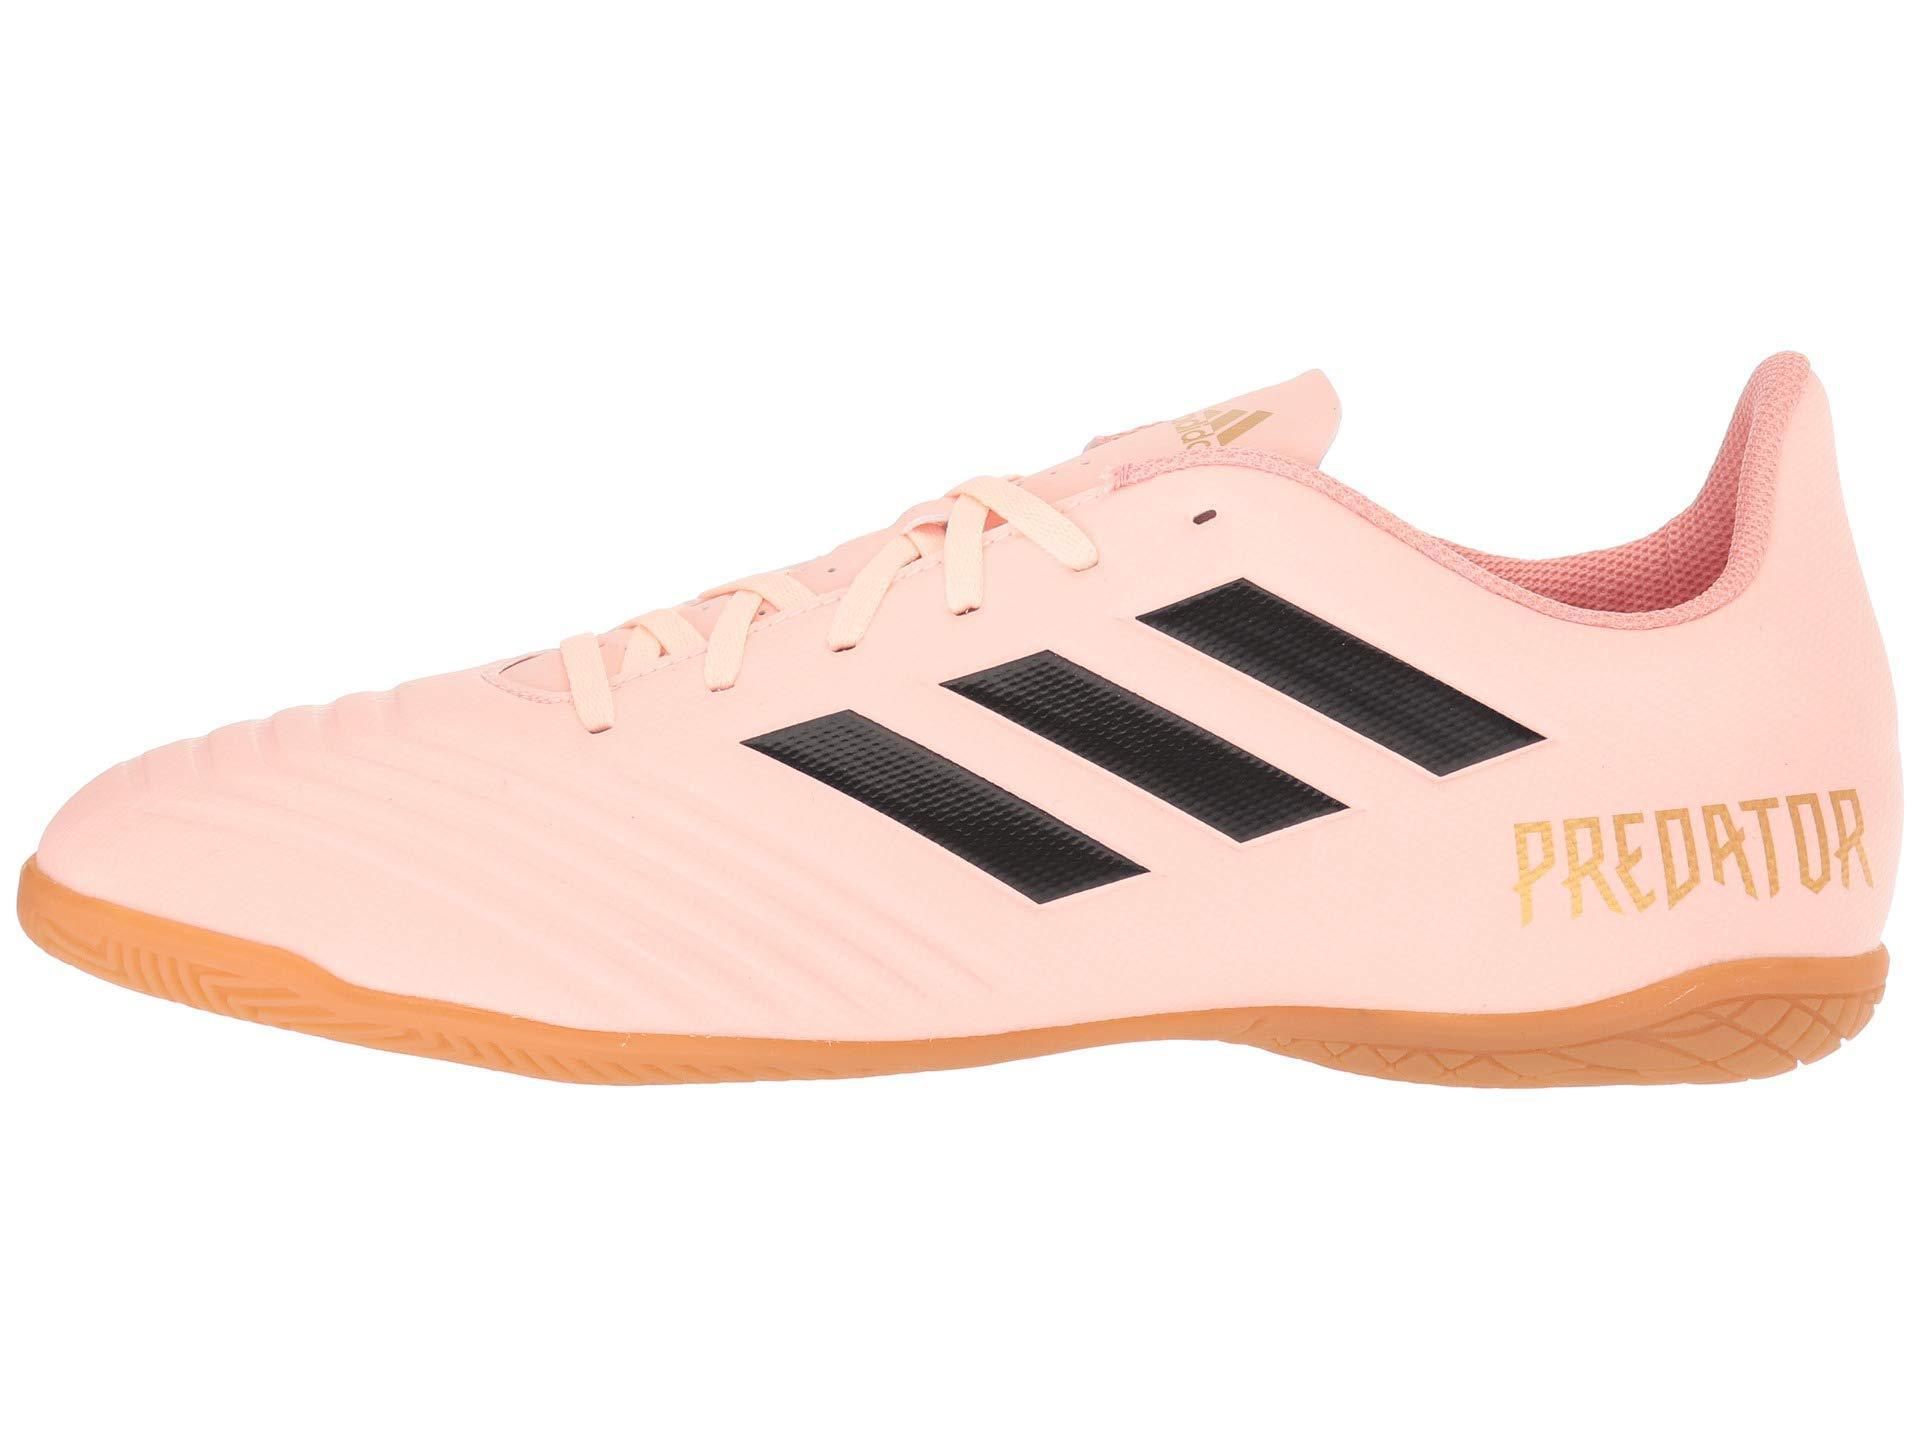 adidas Predator Tango 18.4 IN football shoes men core